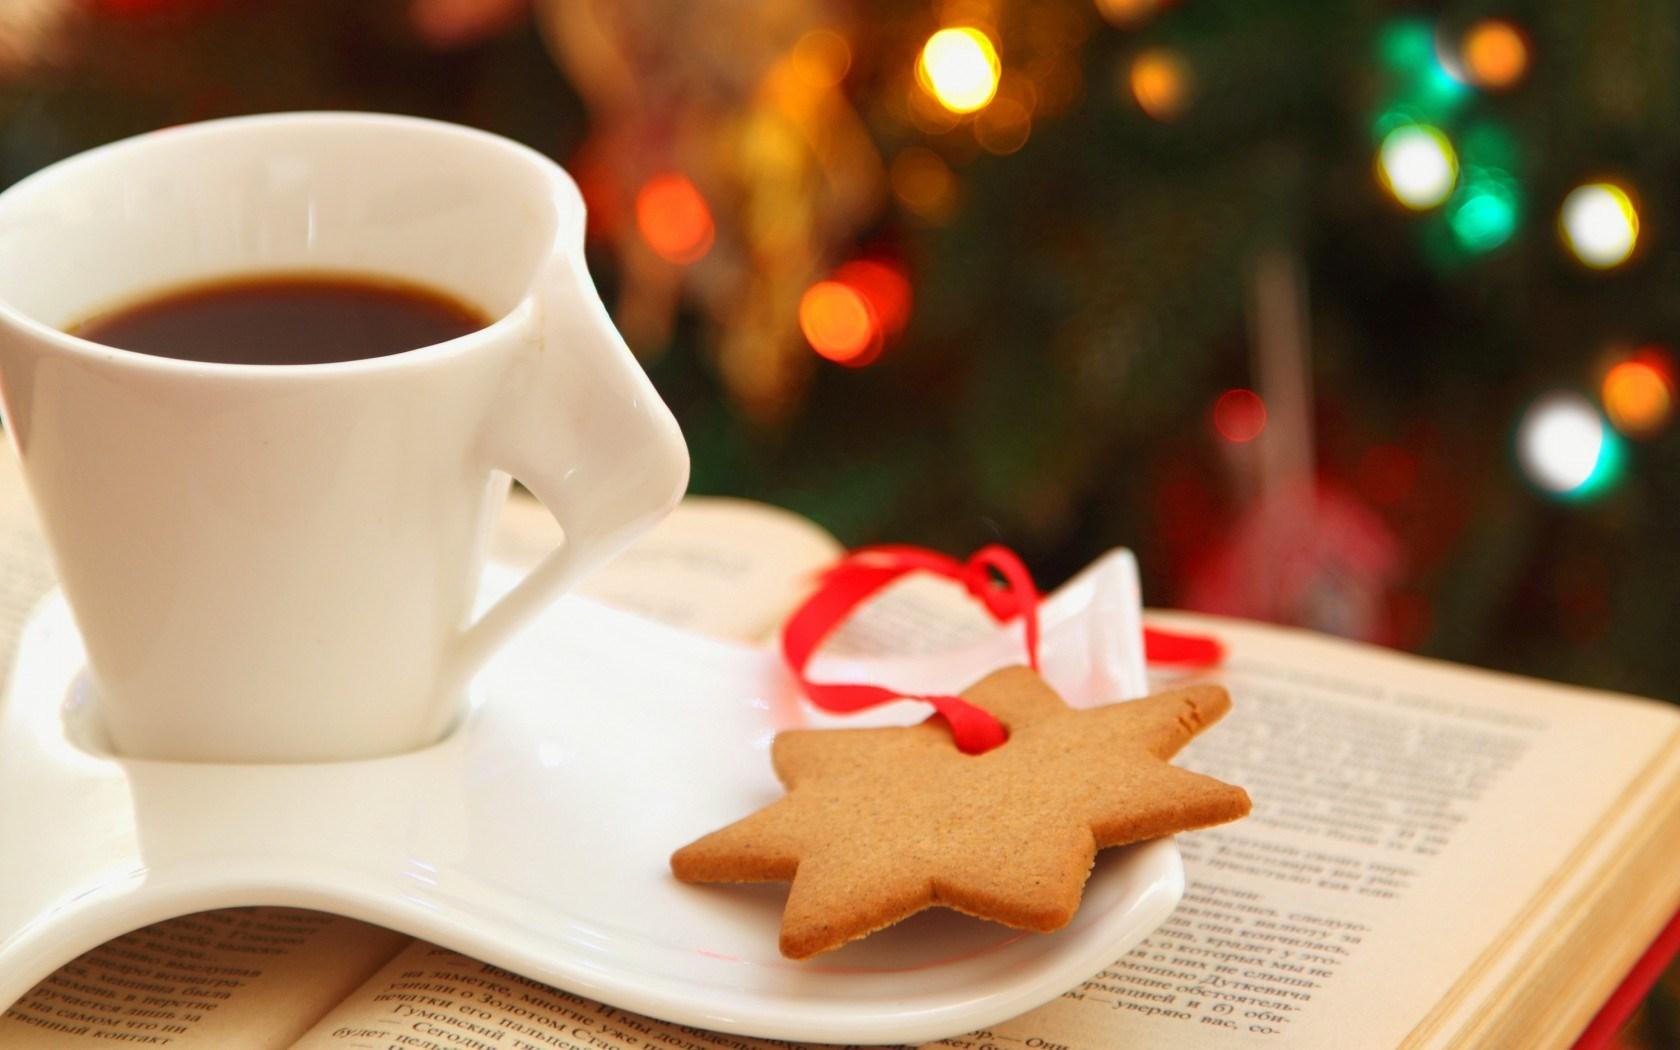 cup-coffee-cookies-star-book-lights-bokeh-christmas-1